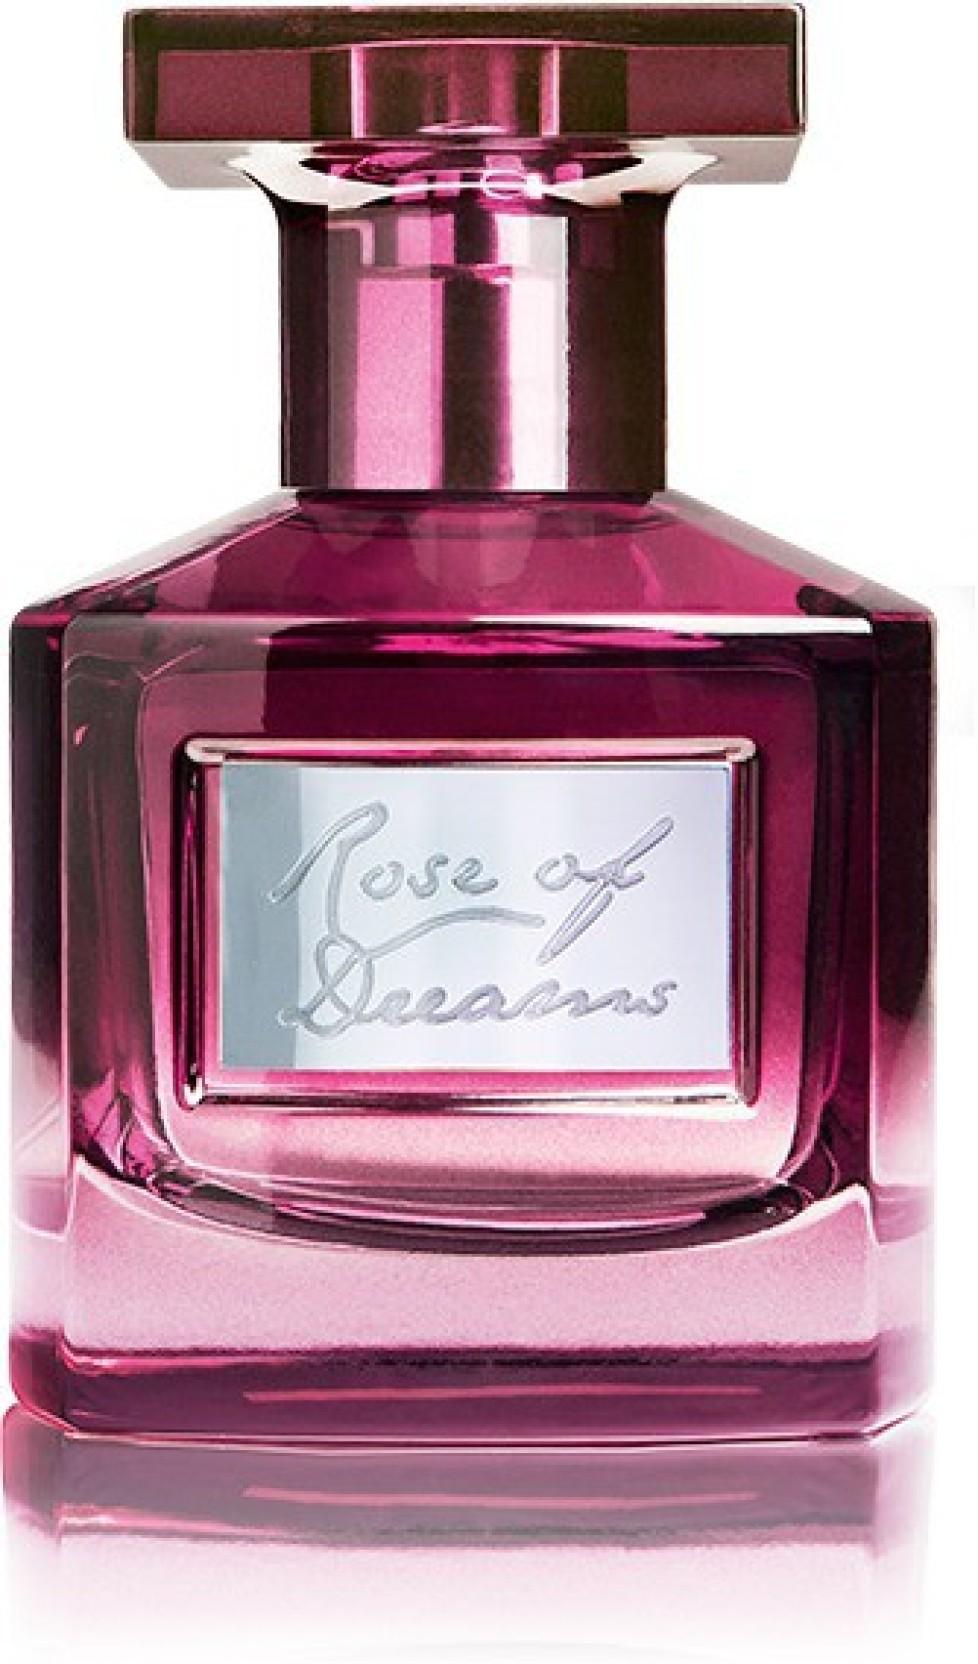 Buy Oriflame Sweden Rose Of Dreams Eau De Parfum 50 Ml Online In Tenderly Miss Giordani Vivacity Perfumed Body Lotion Home